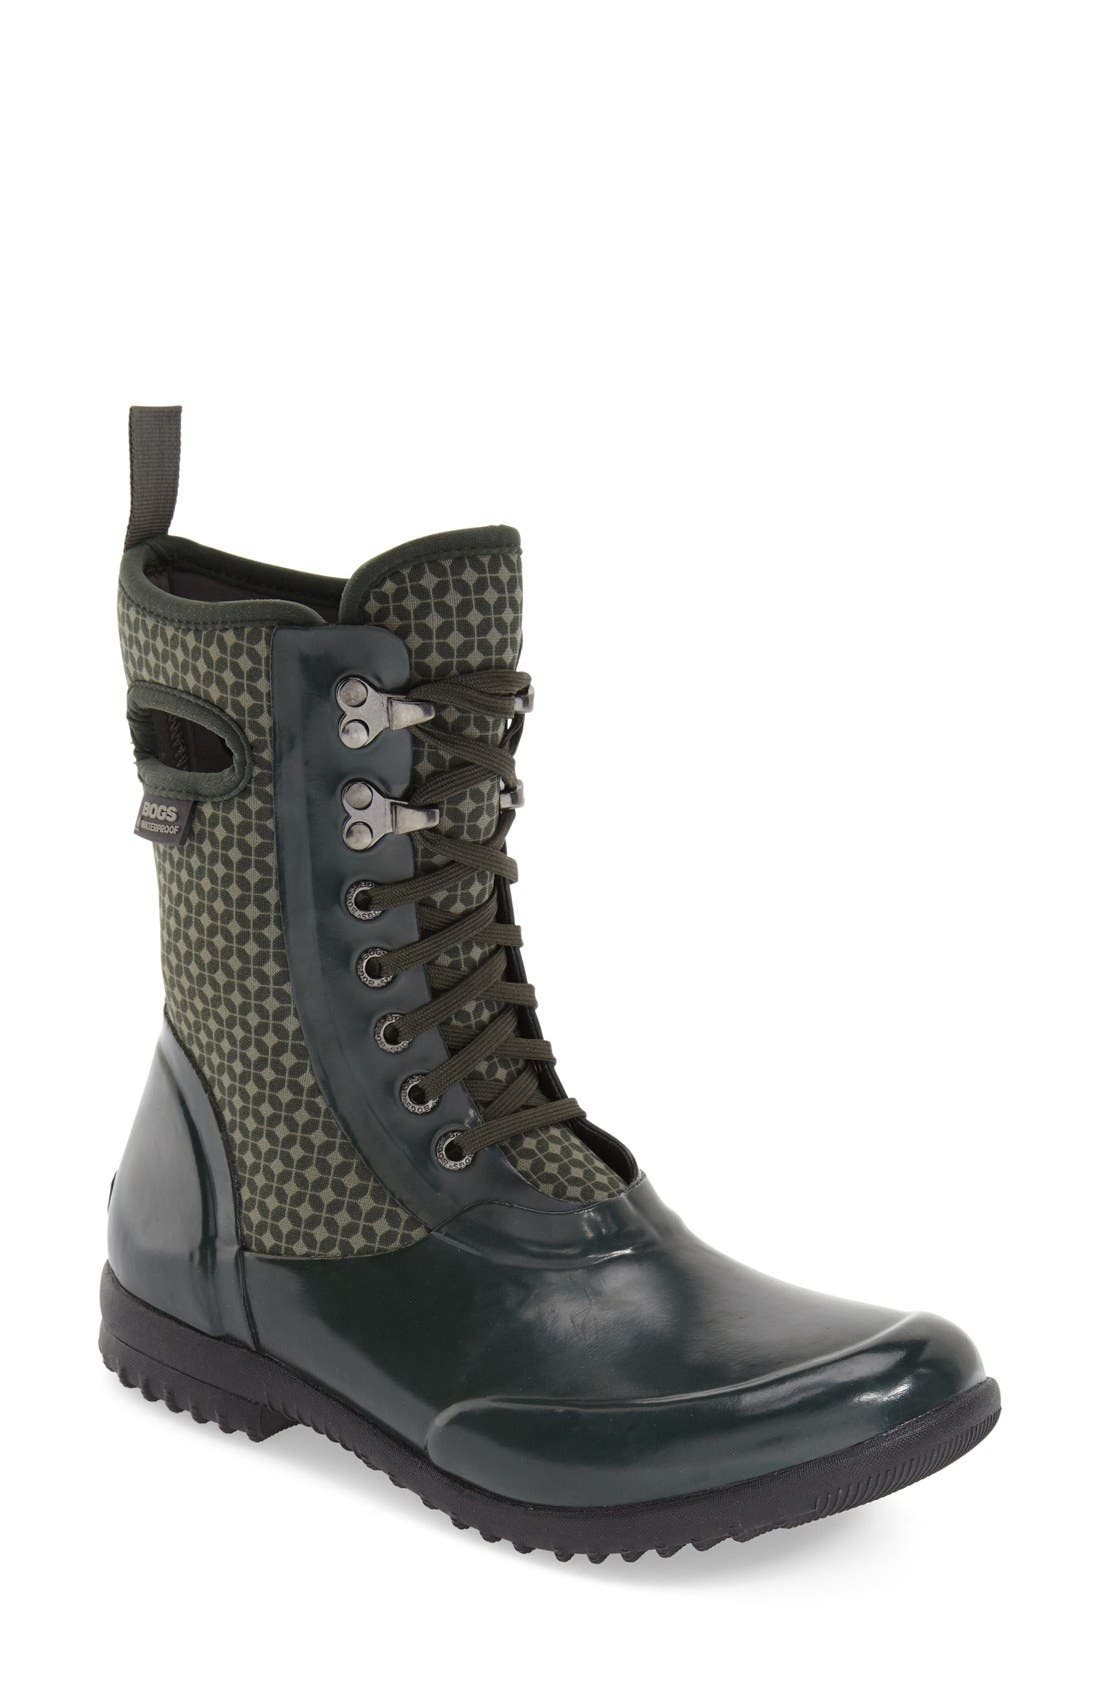 Main Image - Bogs 'Sidney Cravat' Lace-Up Waterproof Boot (Women)